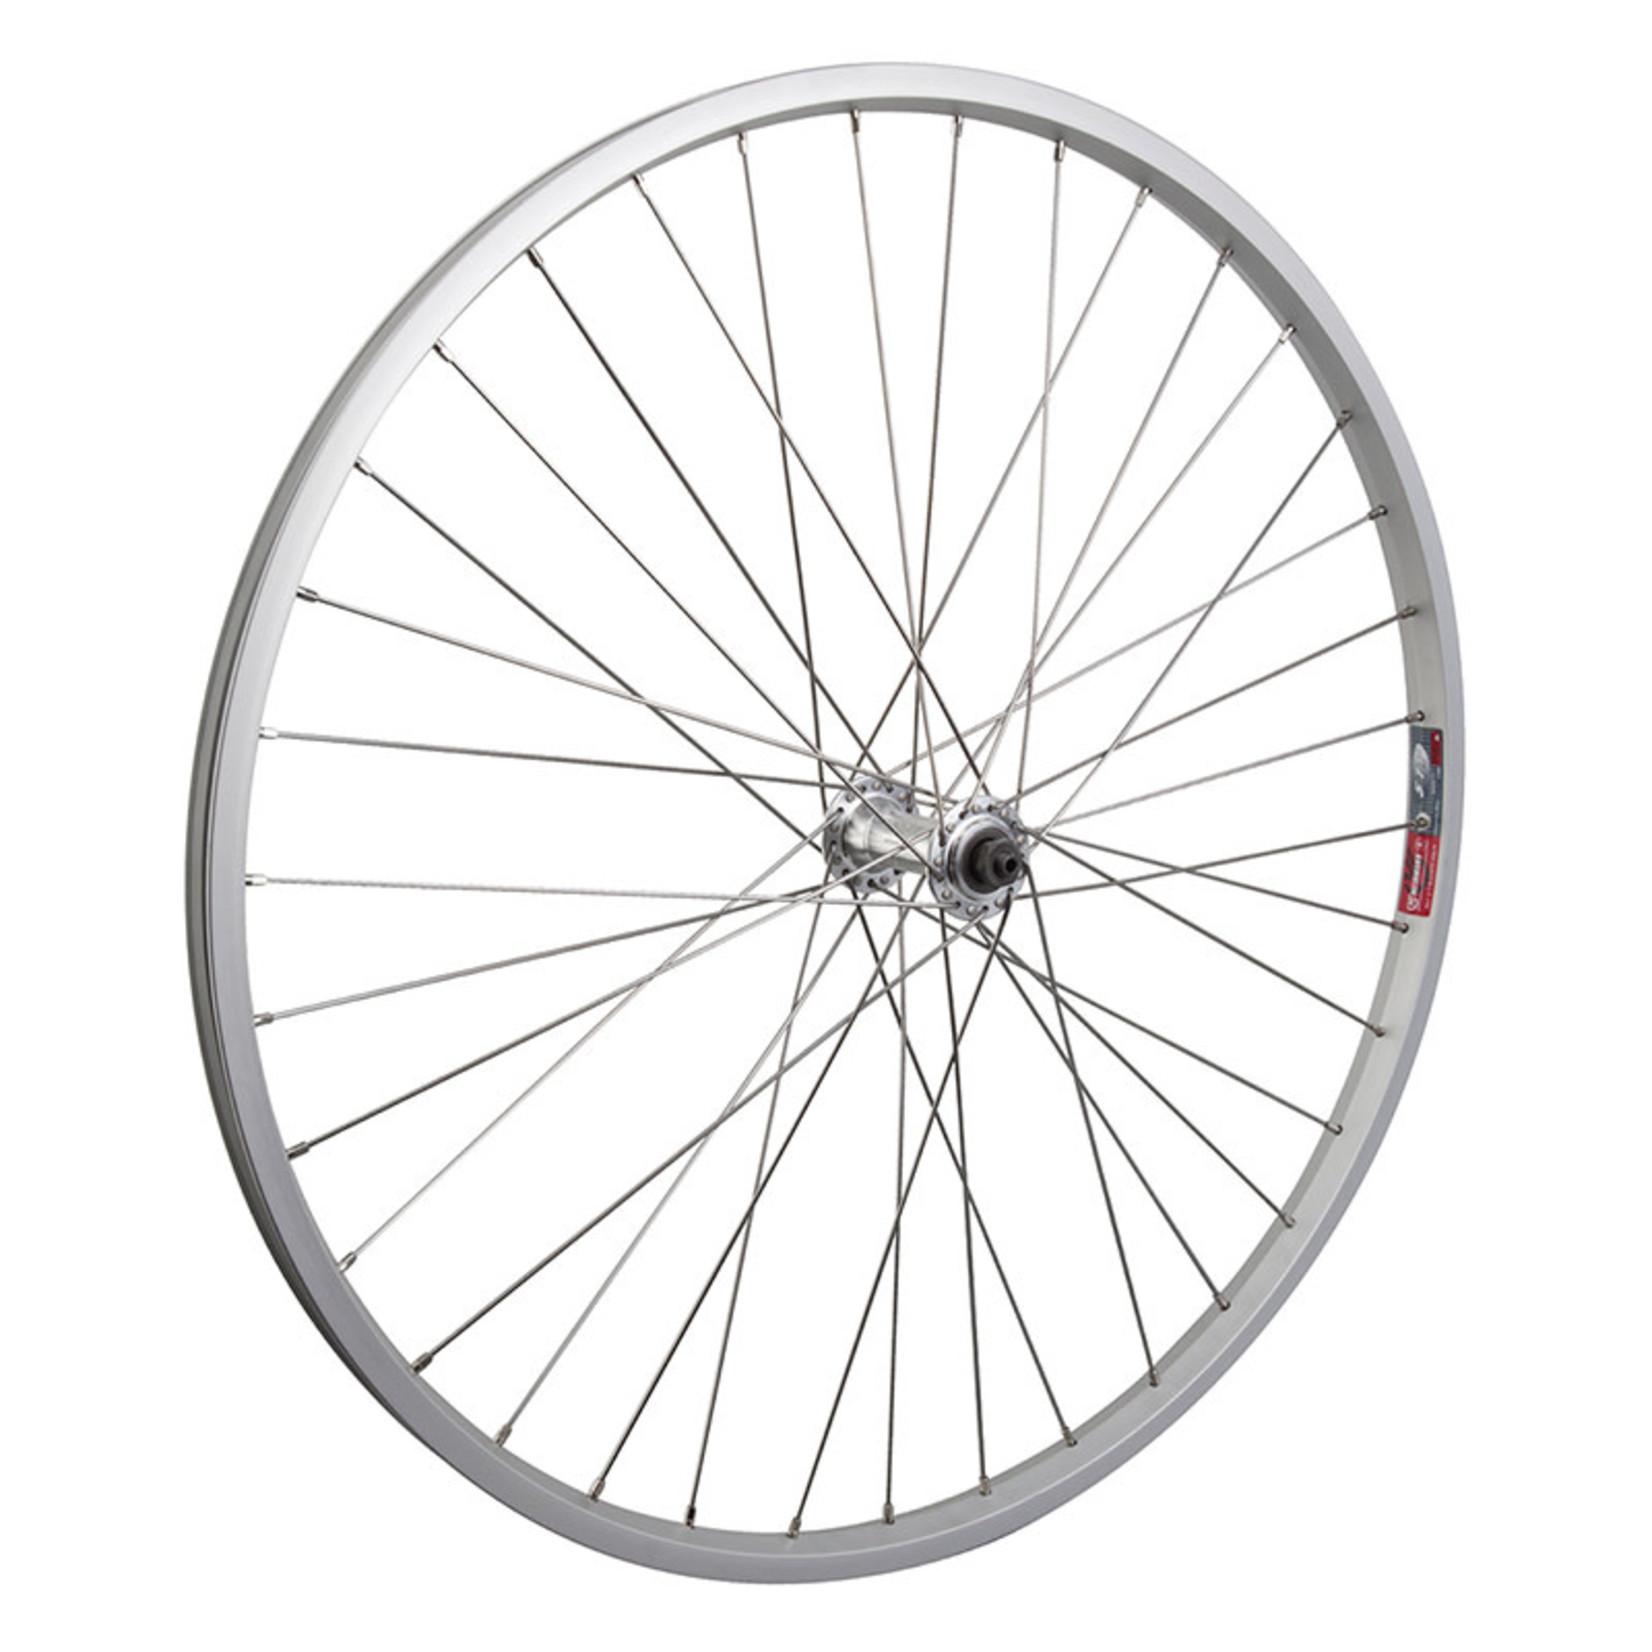 "26"" Front Wheel Alloy Mountain Single Wall QR 14g SS Silver"